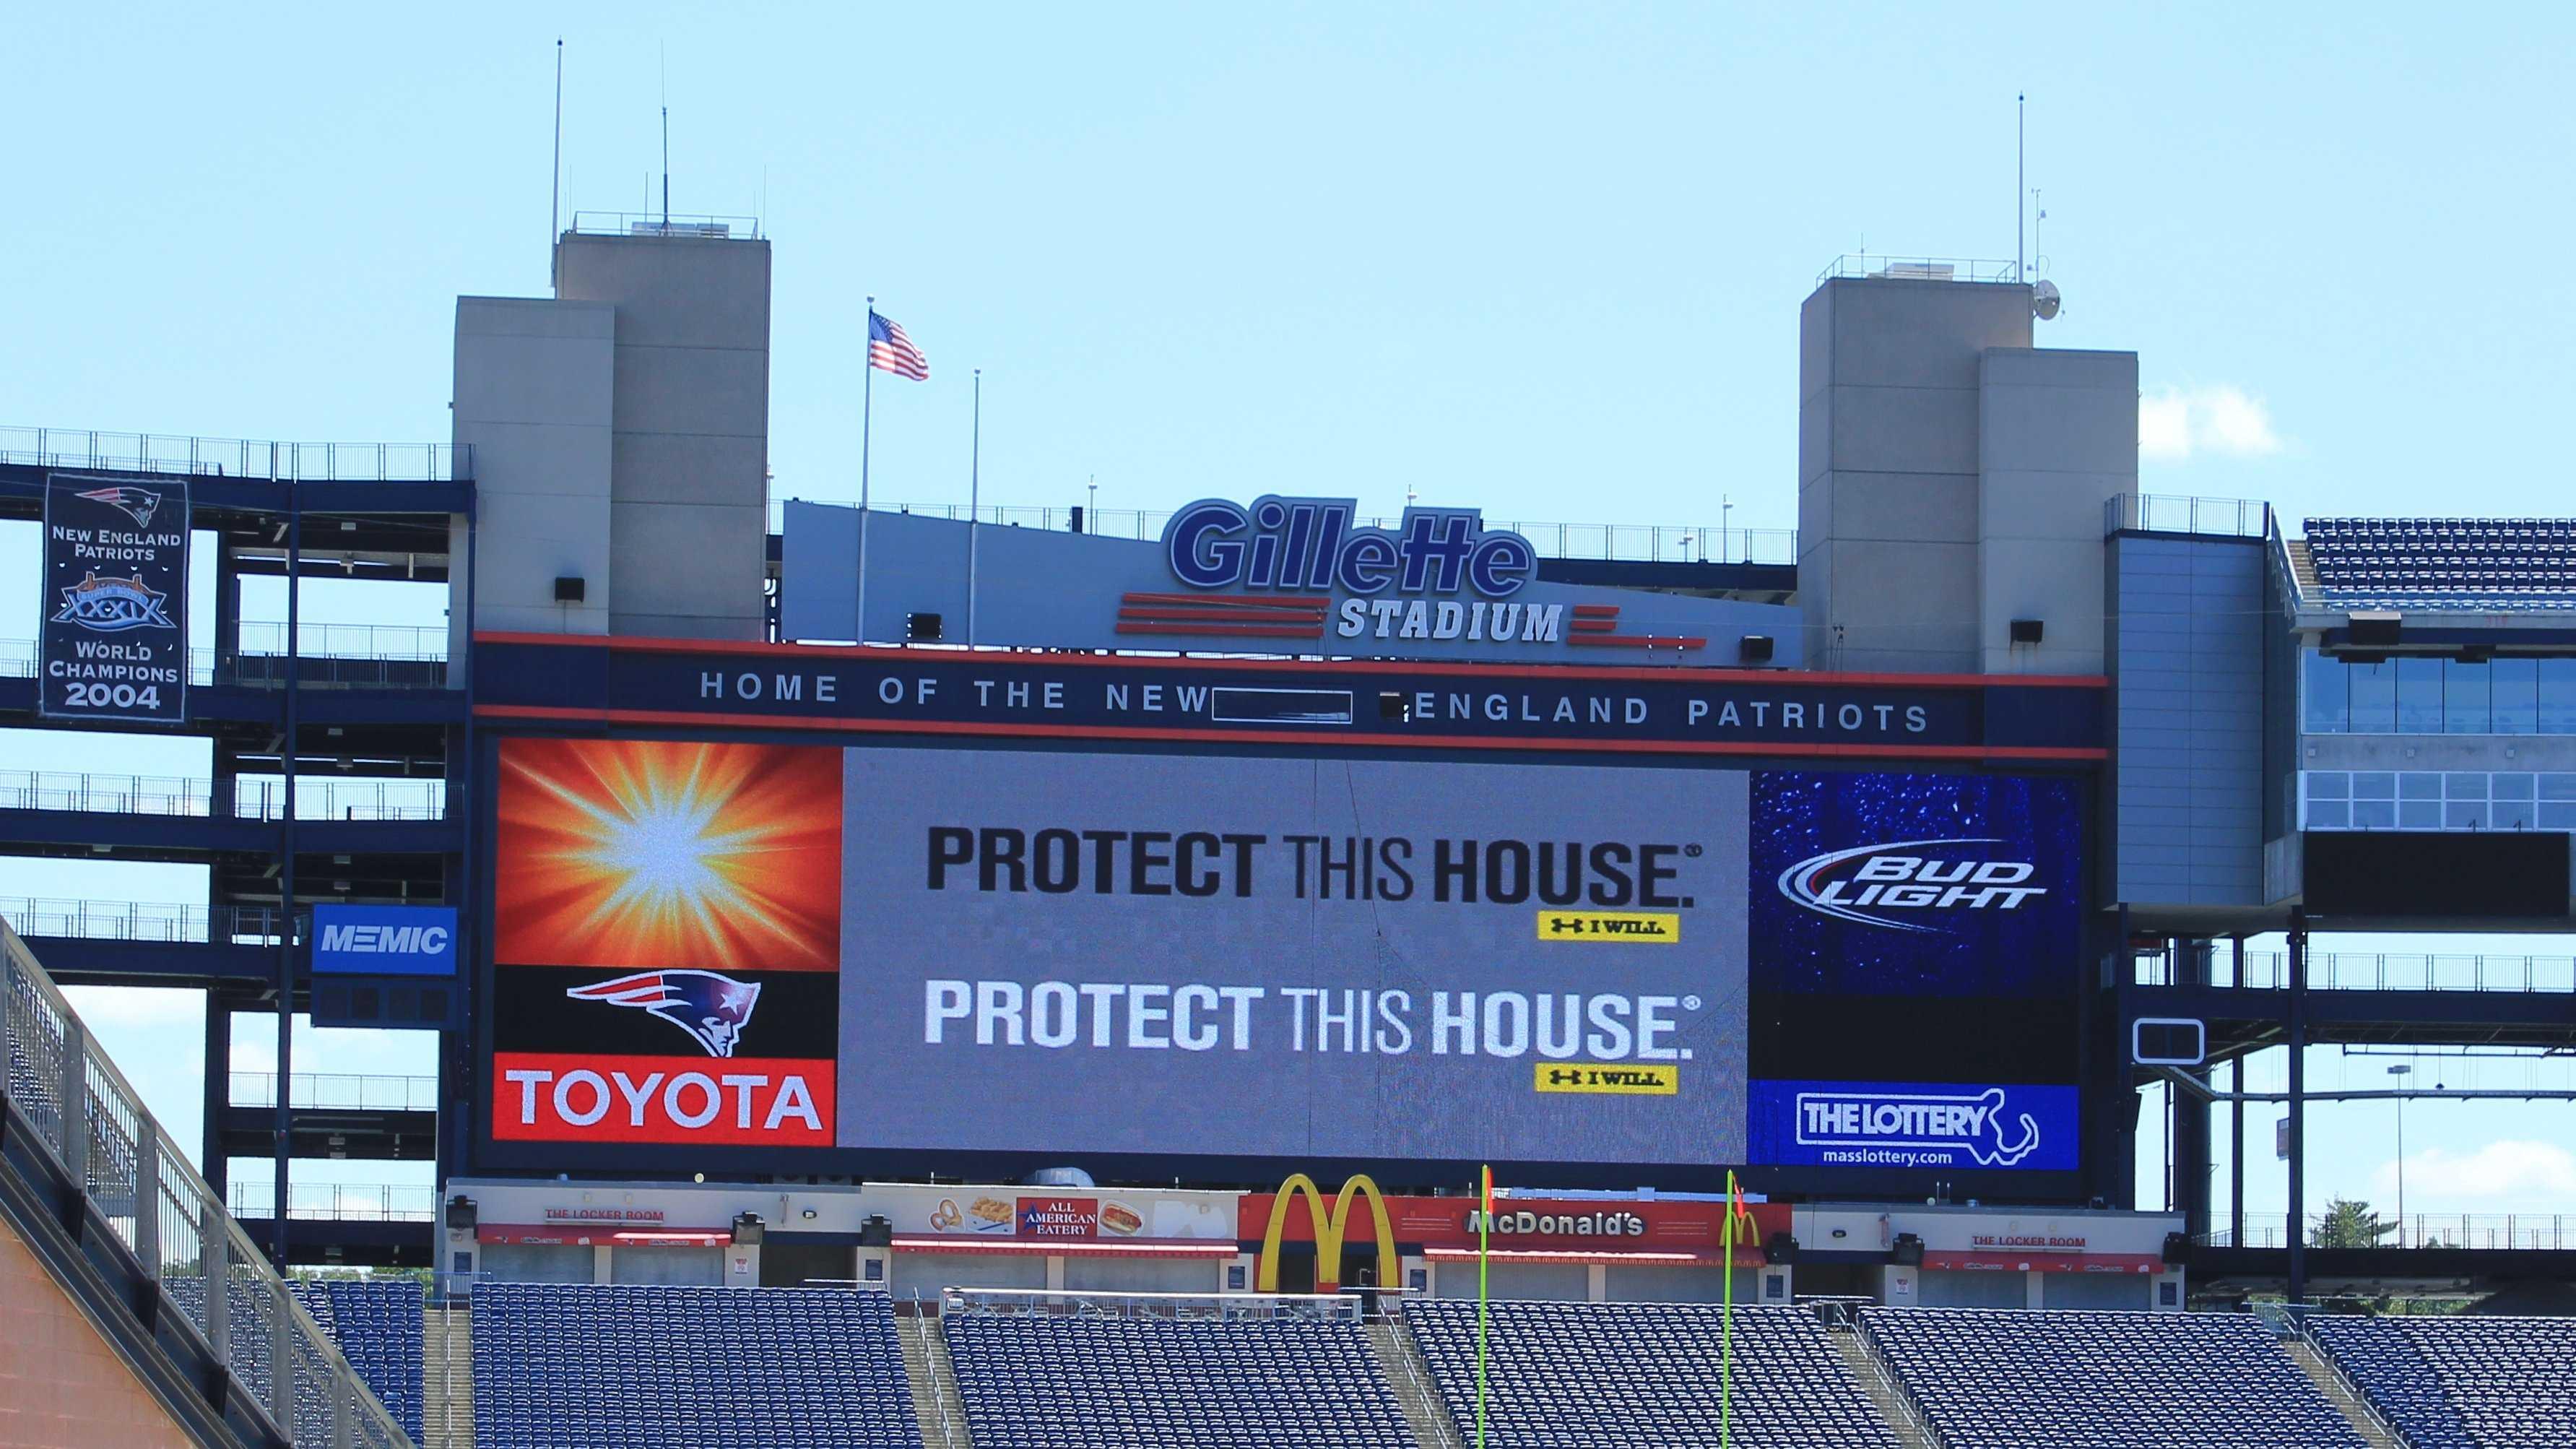 Gillette Stadium Scoreboard 4x6.JPG